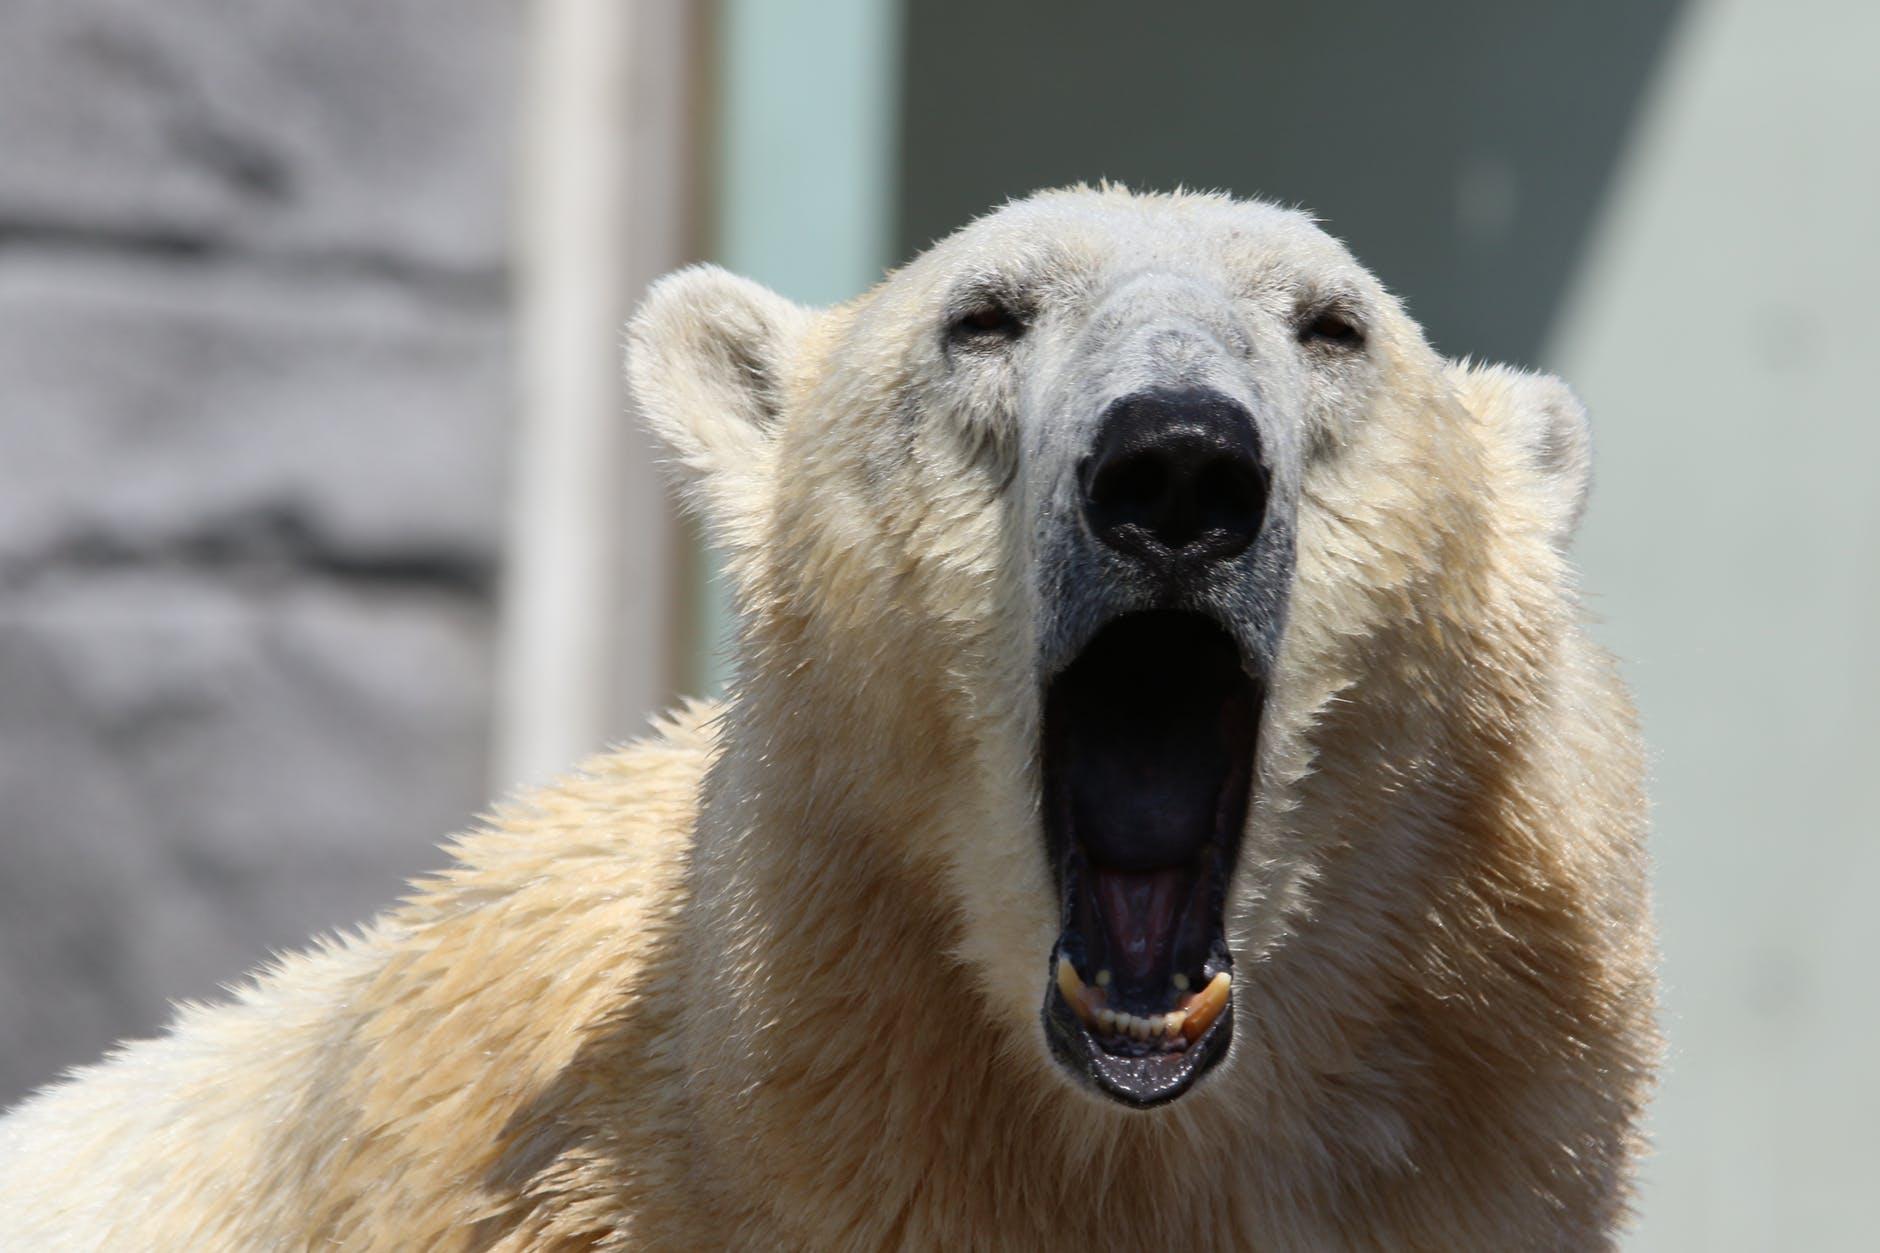 animal bear bored close up